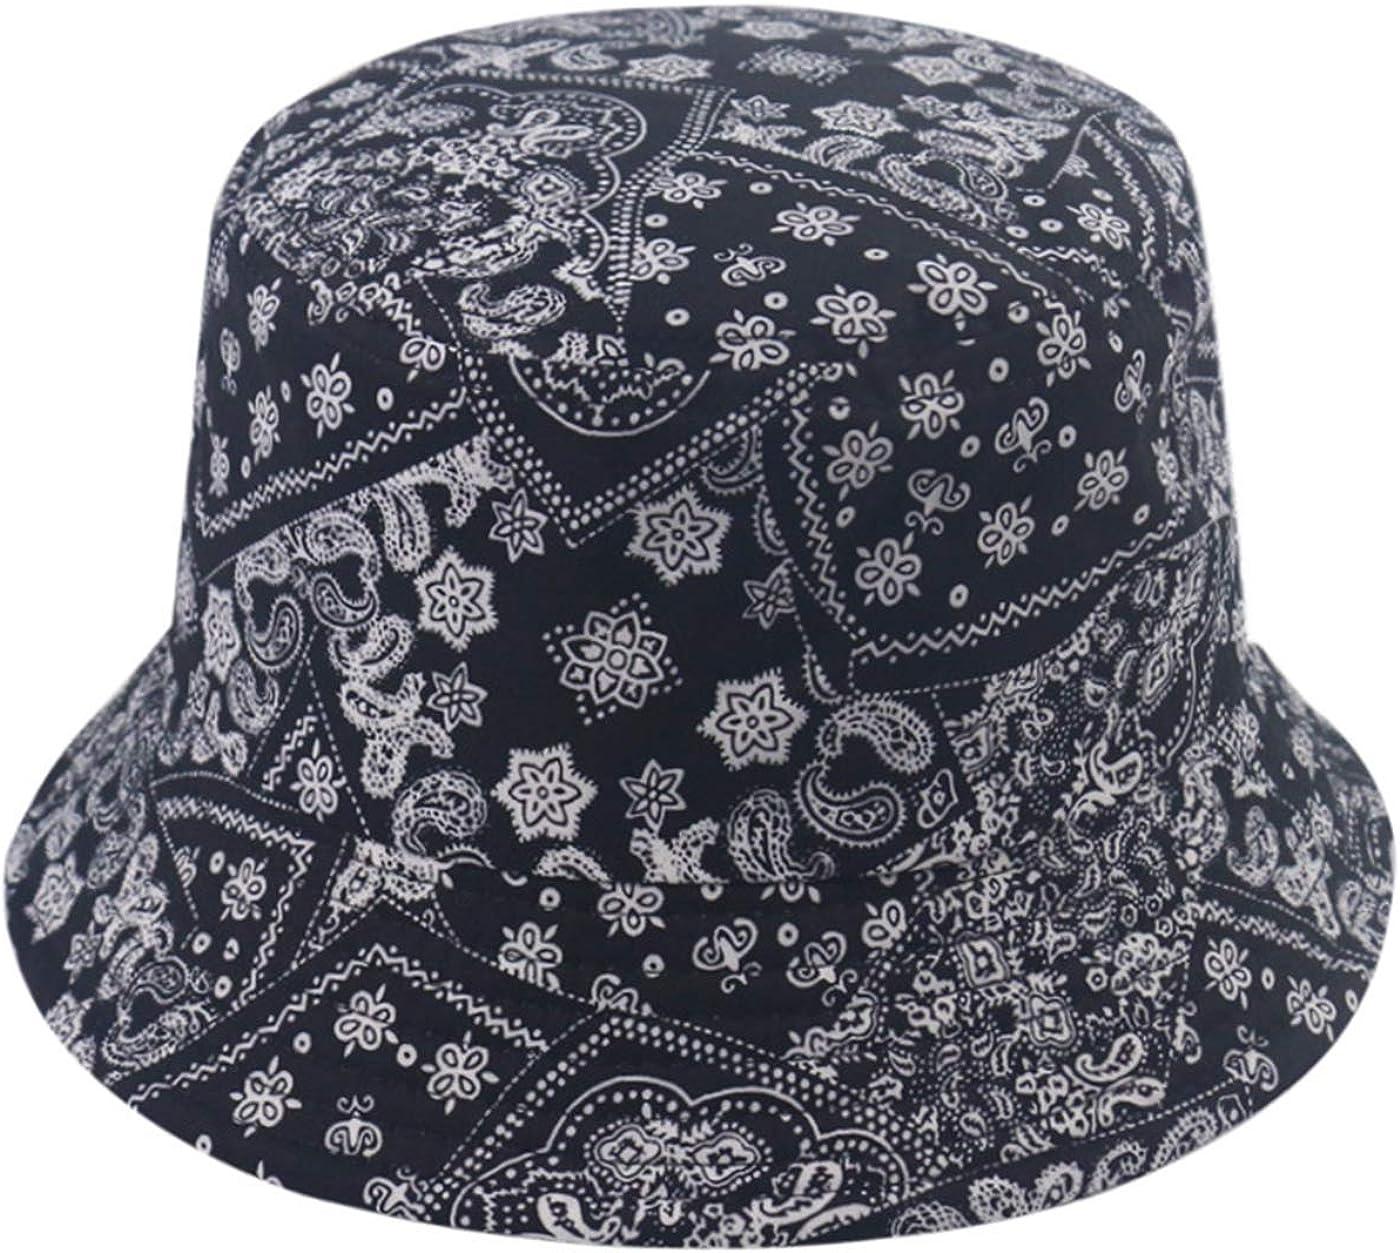 Bucket Hats for Women, Summer Print Double-Side-Wear Fishing Hats Outdoor Beach Caps (Cashew Black Flower): Clothing